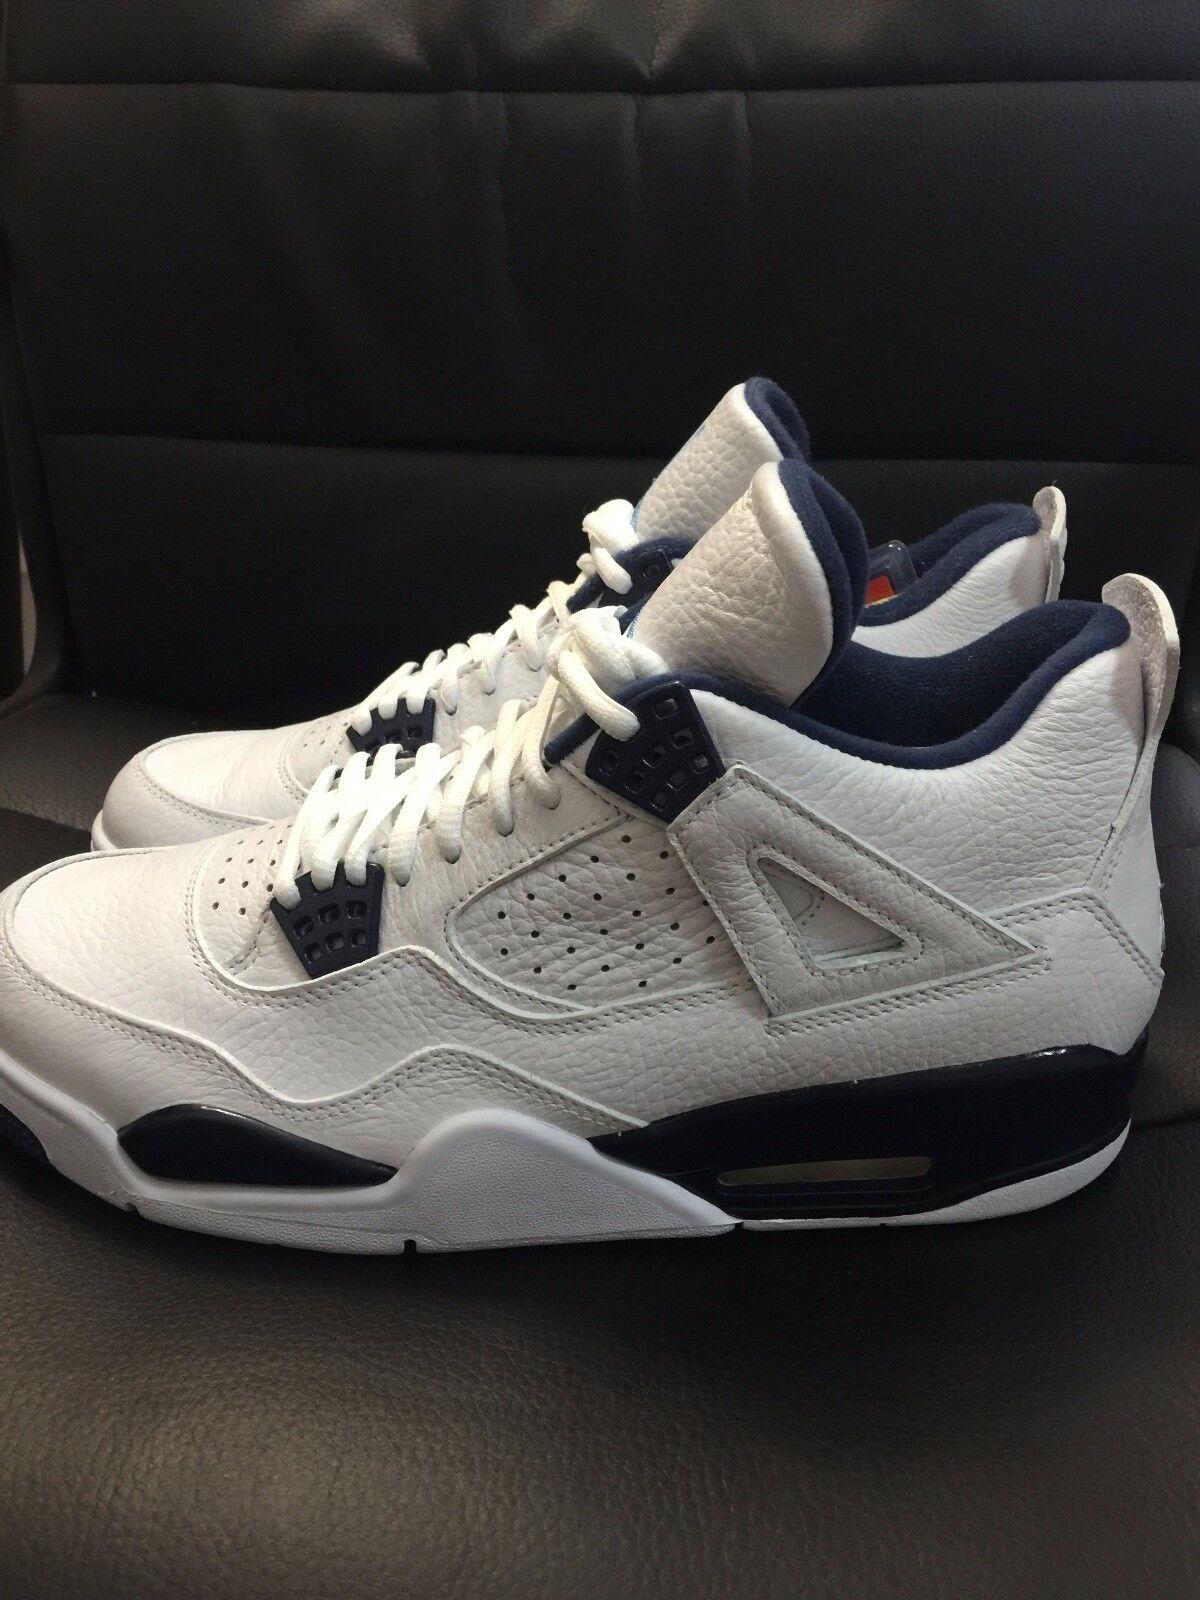 Air Jordan Retro 4 Legend bluee Size 10